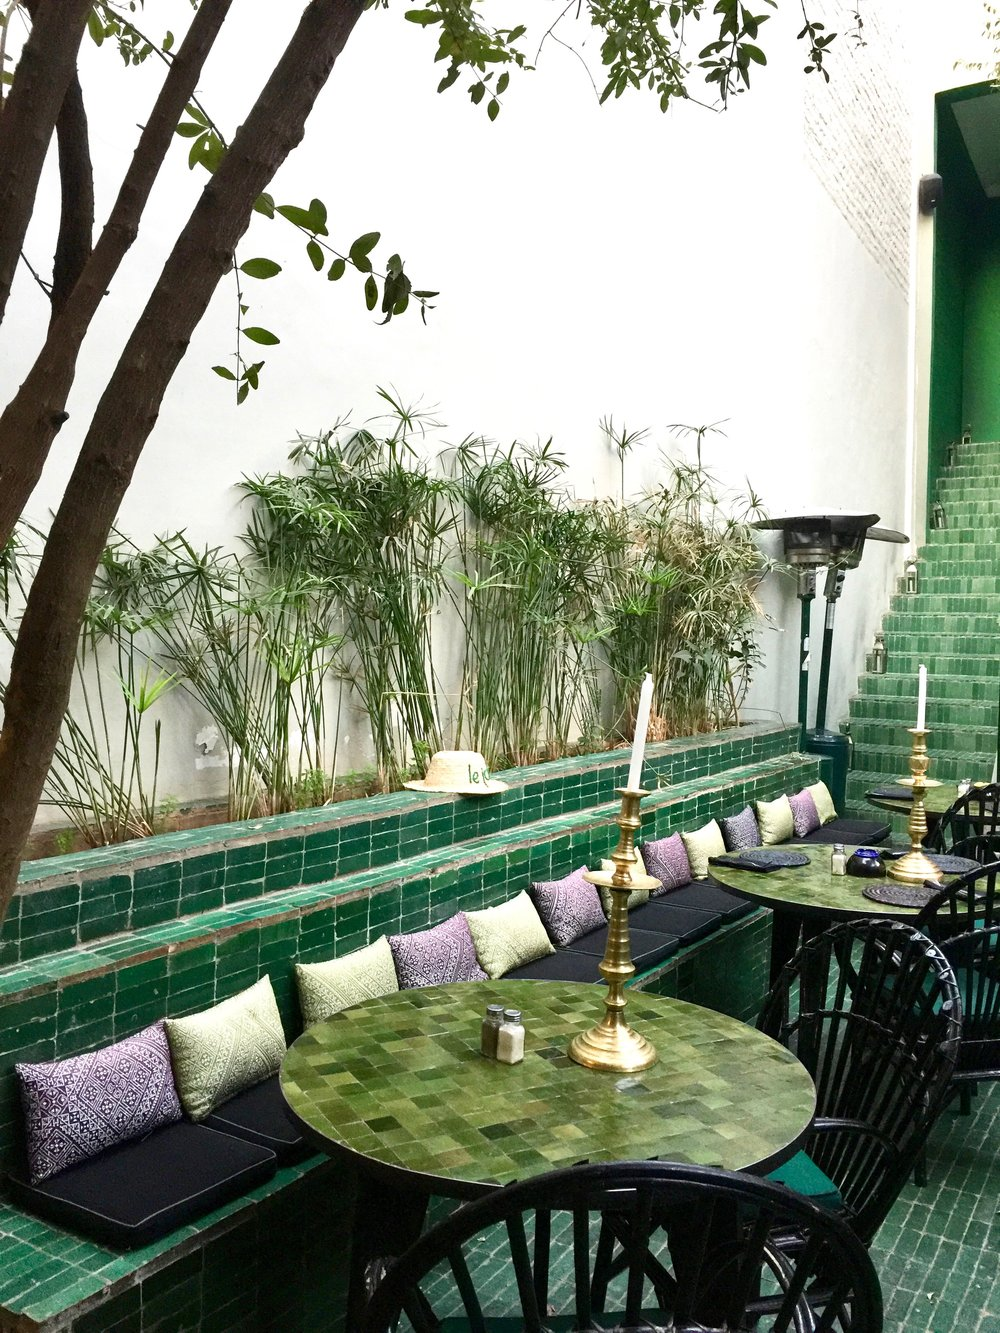 Le Jardin, Marrakech.